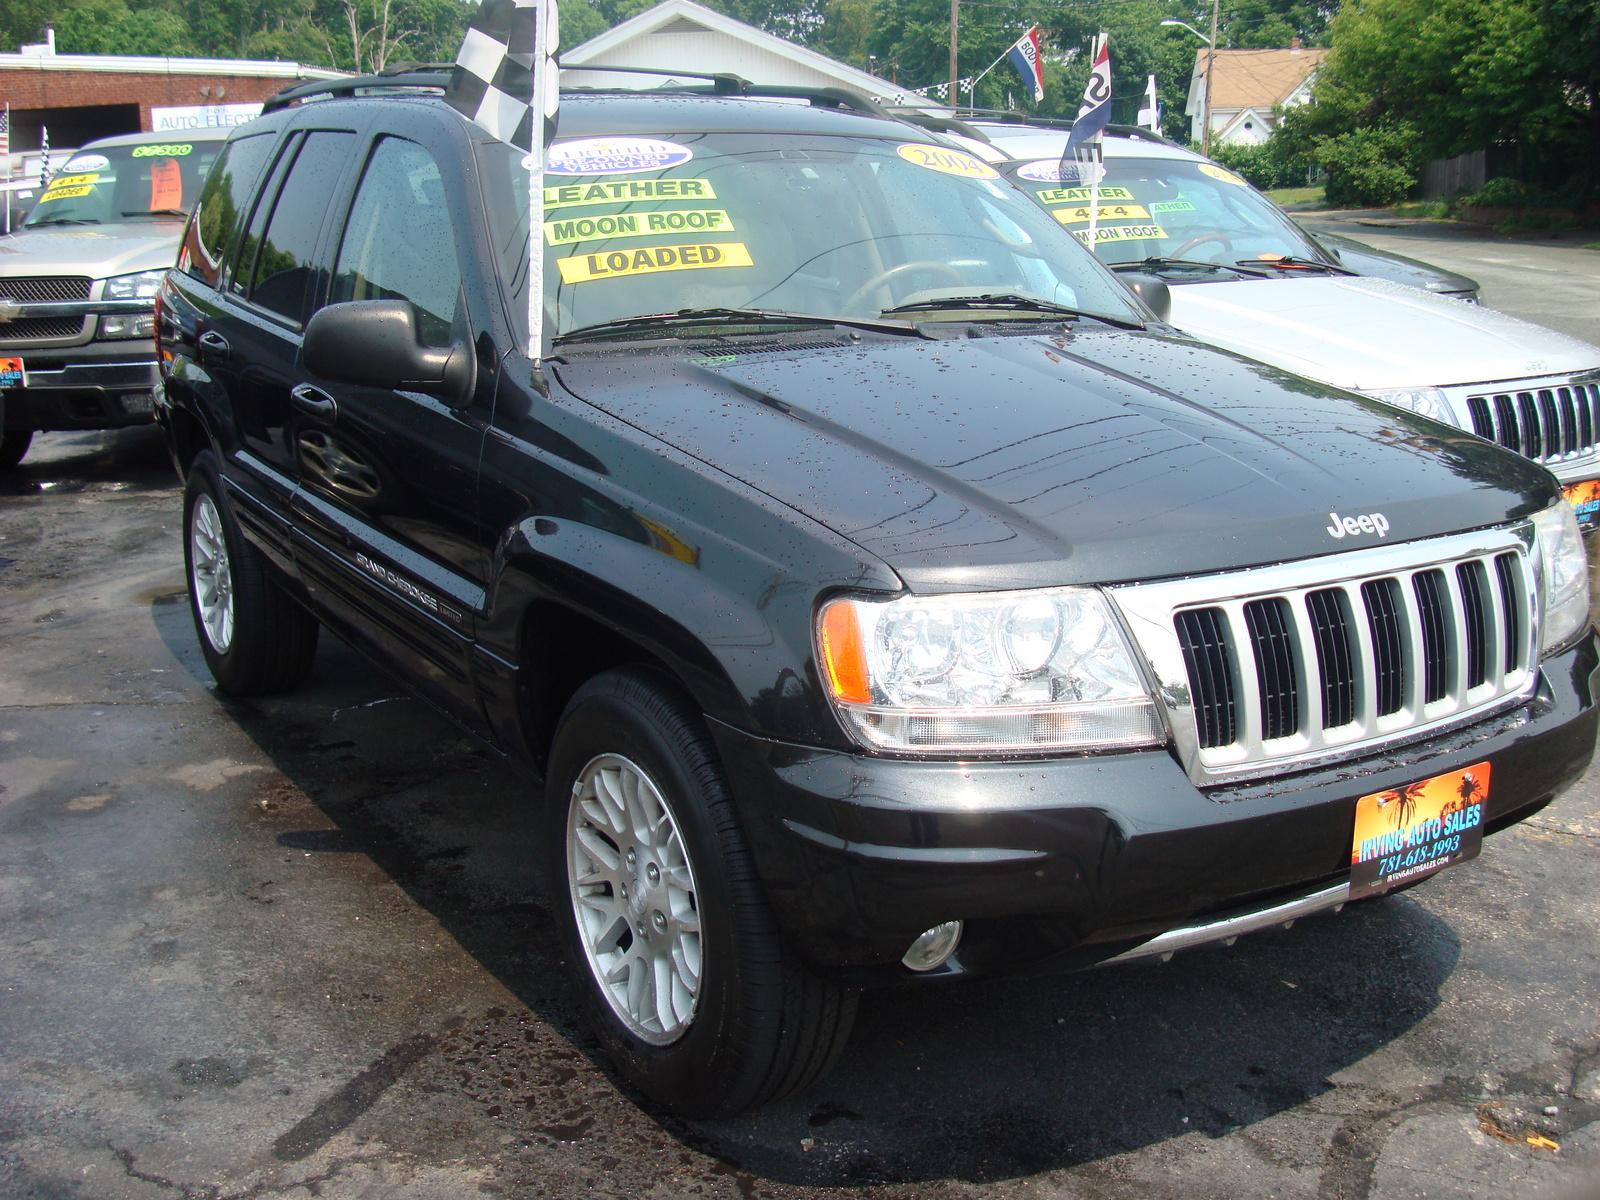 2011 jeep grand cherokee problems defects complaints autos weblog. Black Bedroom Furniture Sets. Home Design Ideas